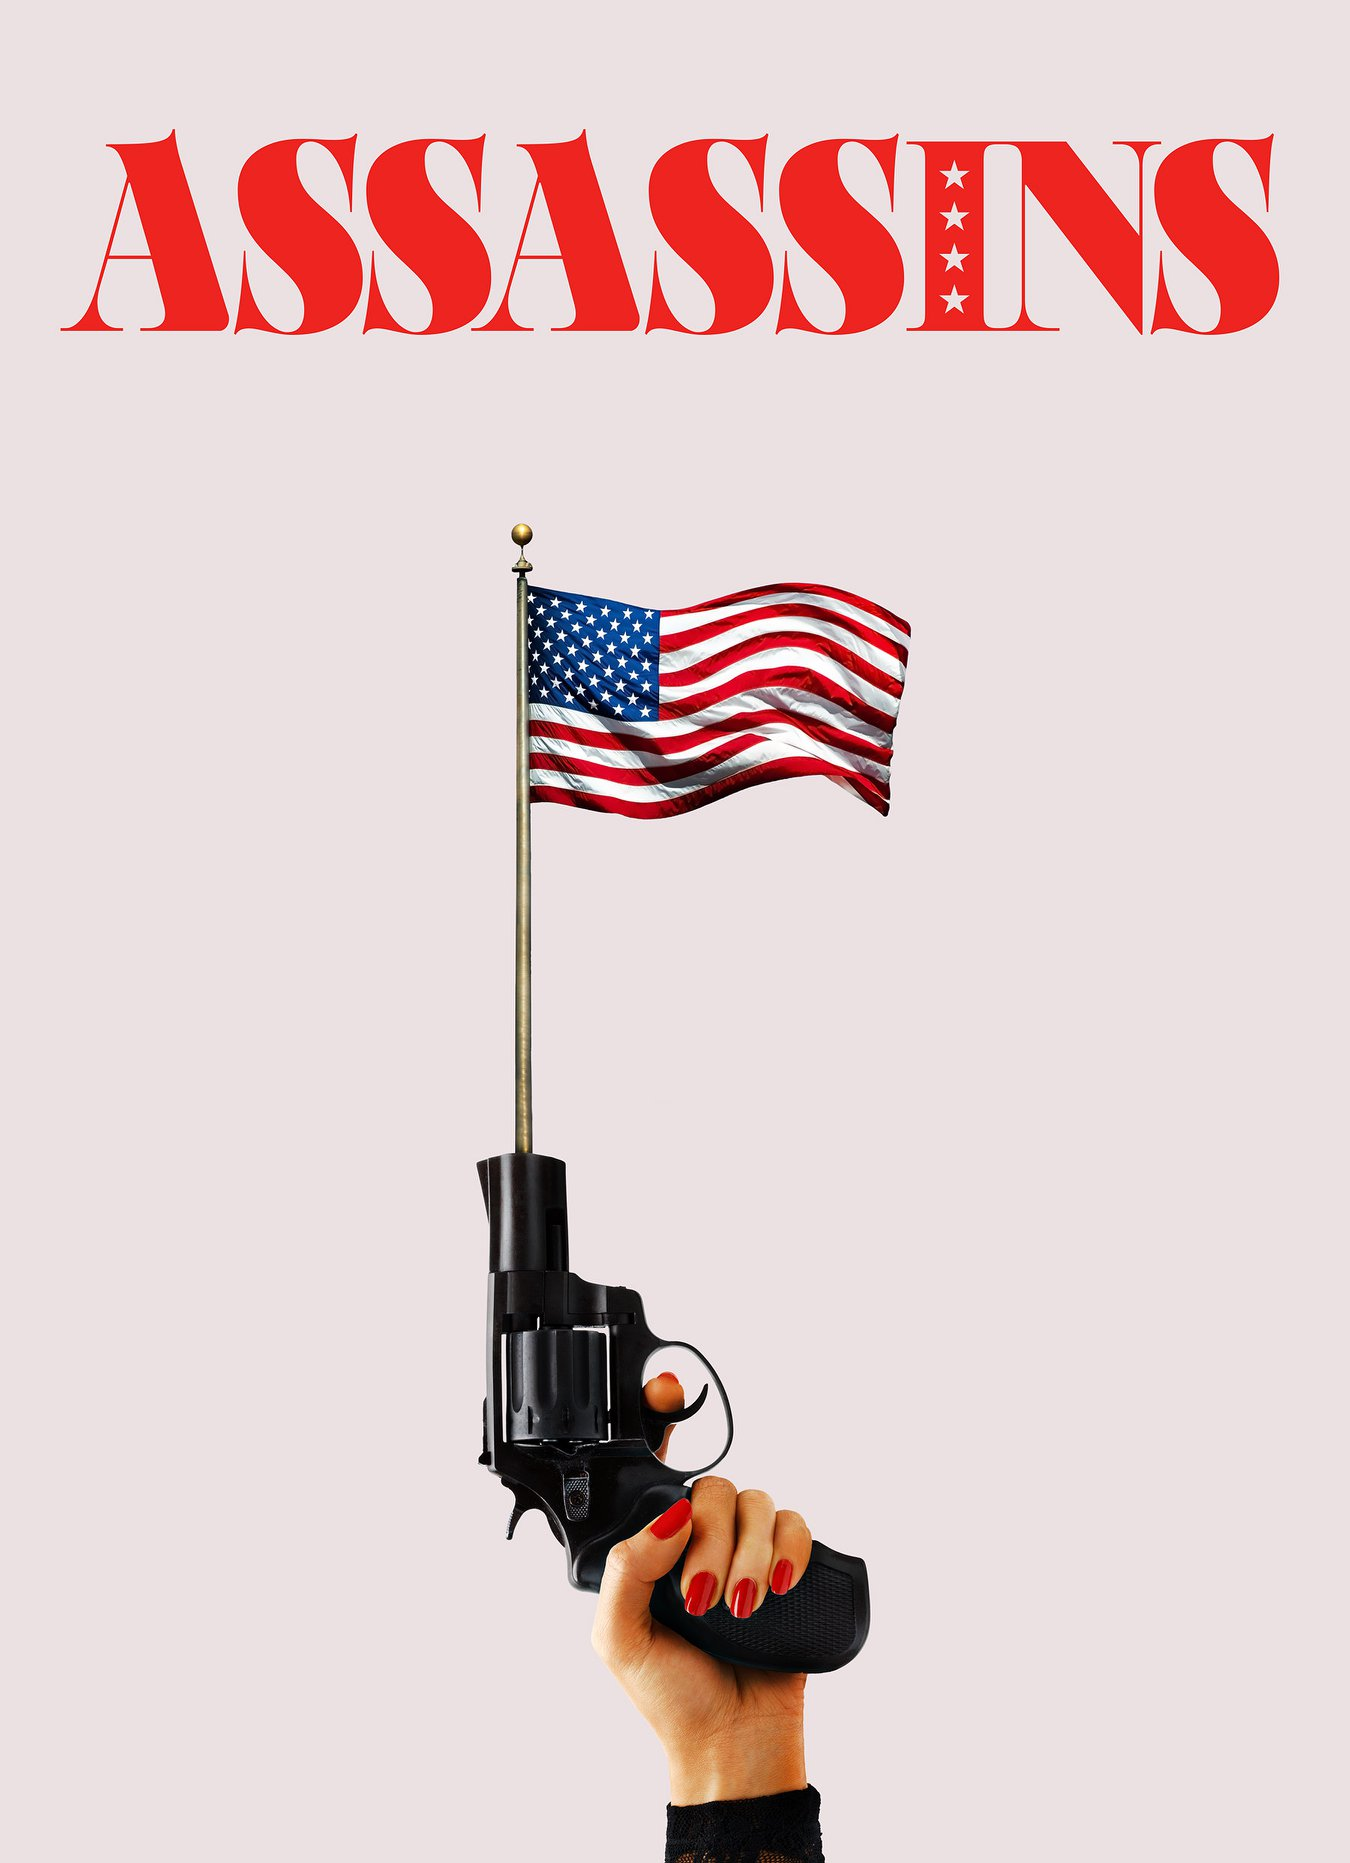 Andrew Broderick, Jason Cadieux, Kyle Golemba, assassins, Sondheim, Shaw Festival 2020 Season